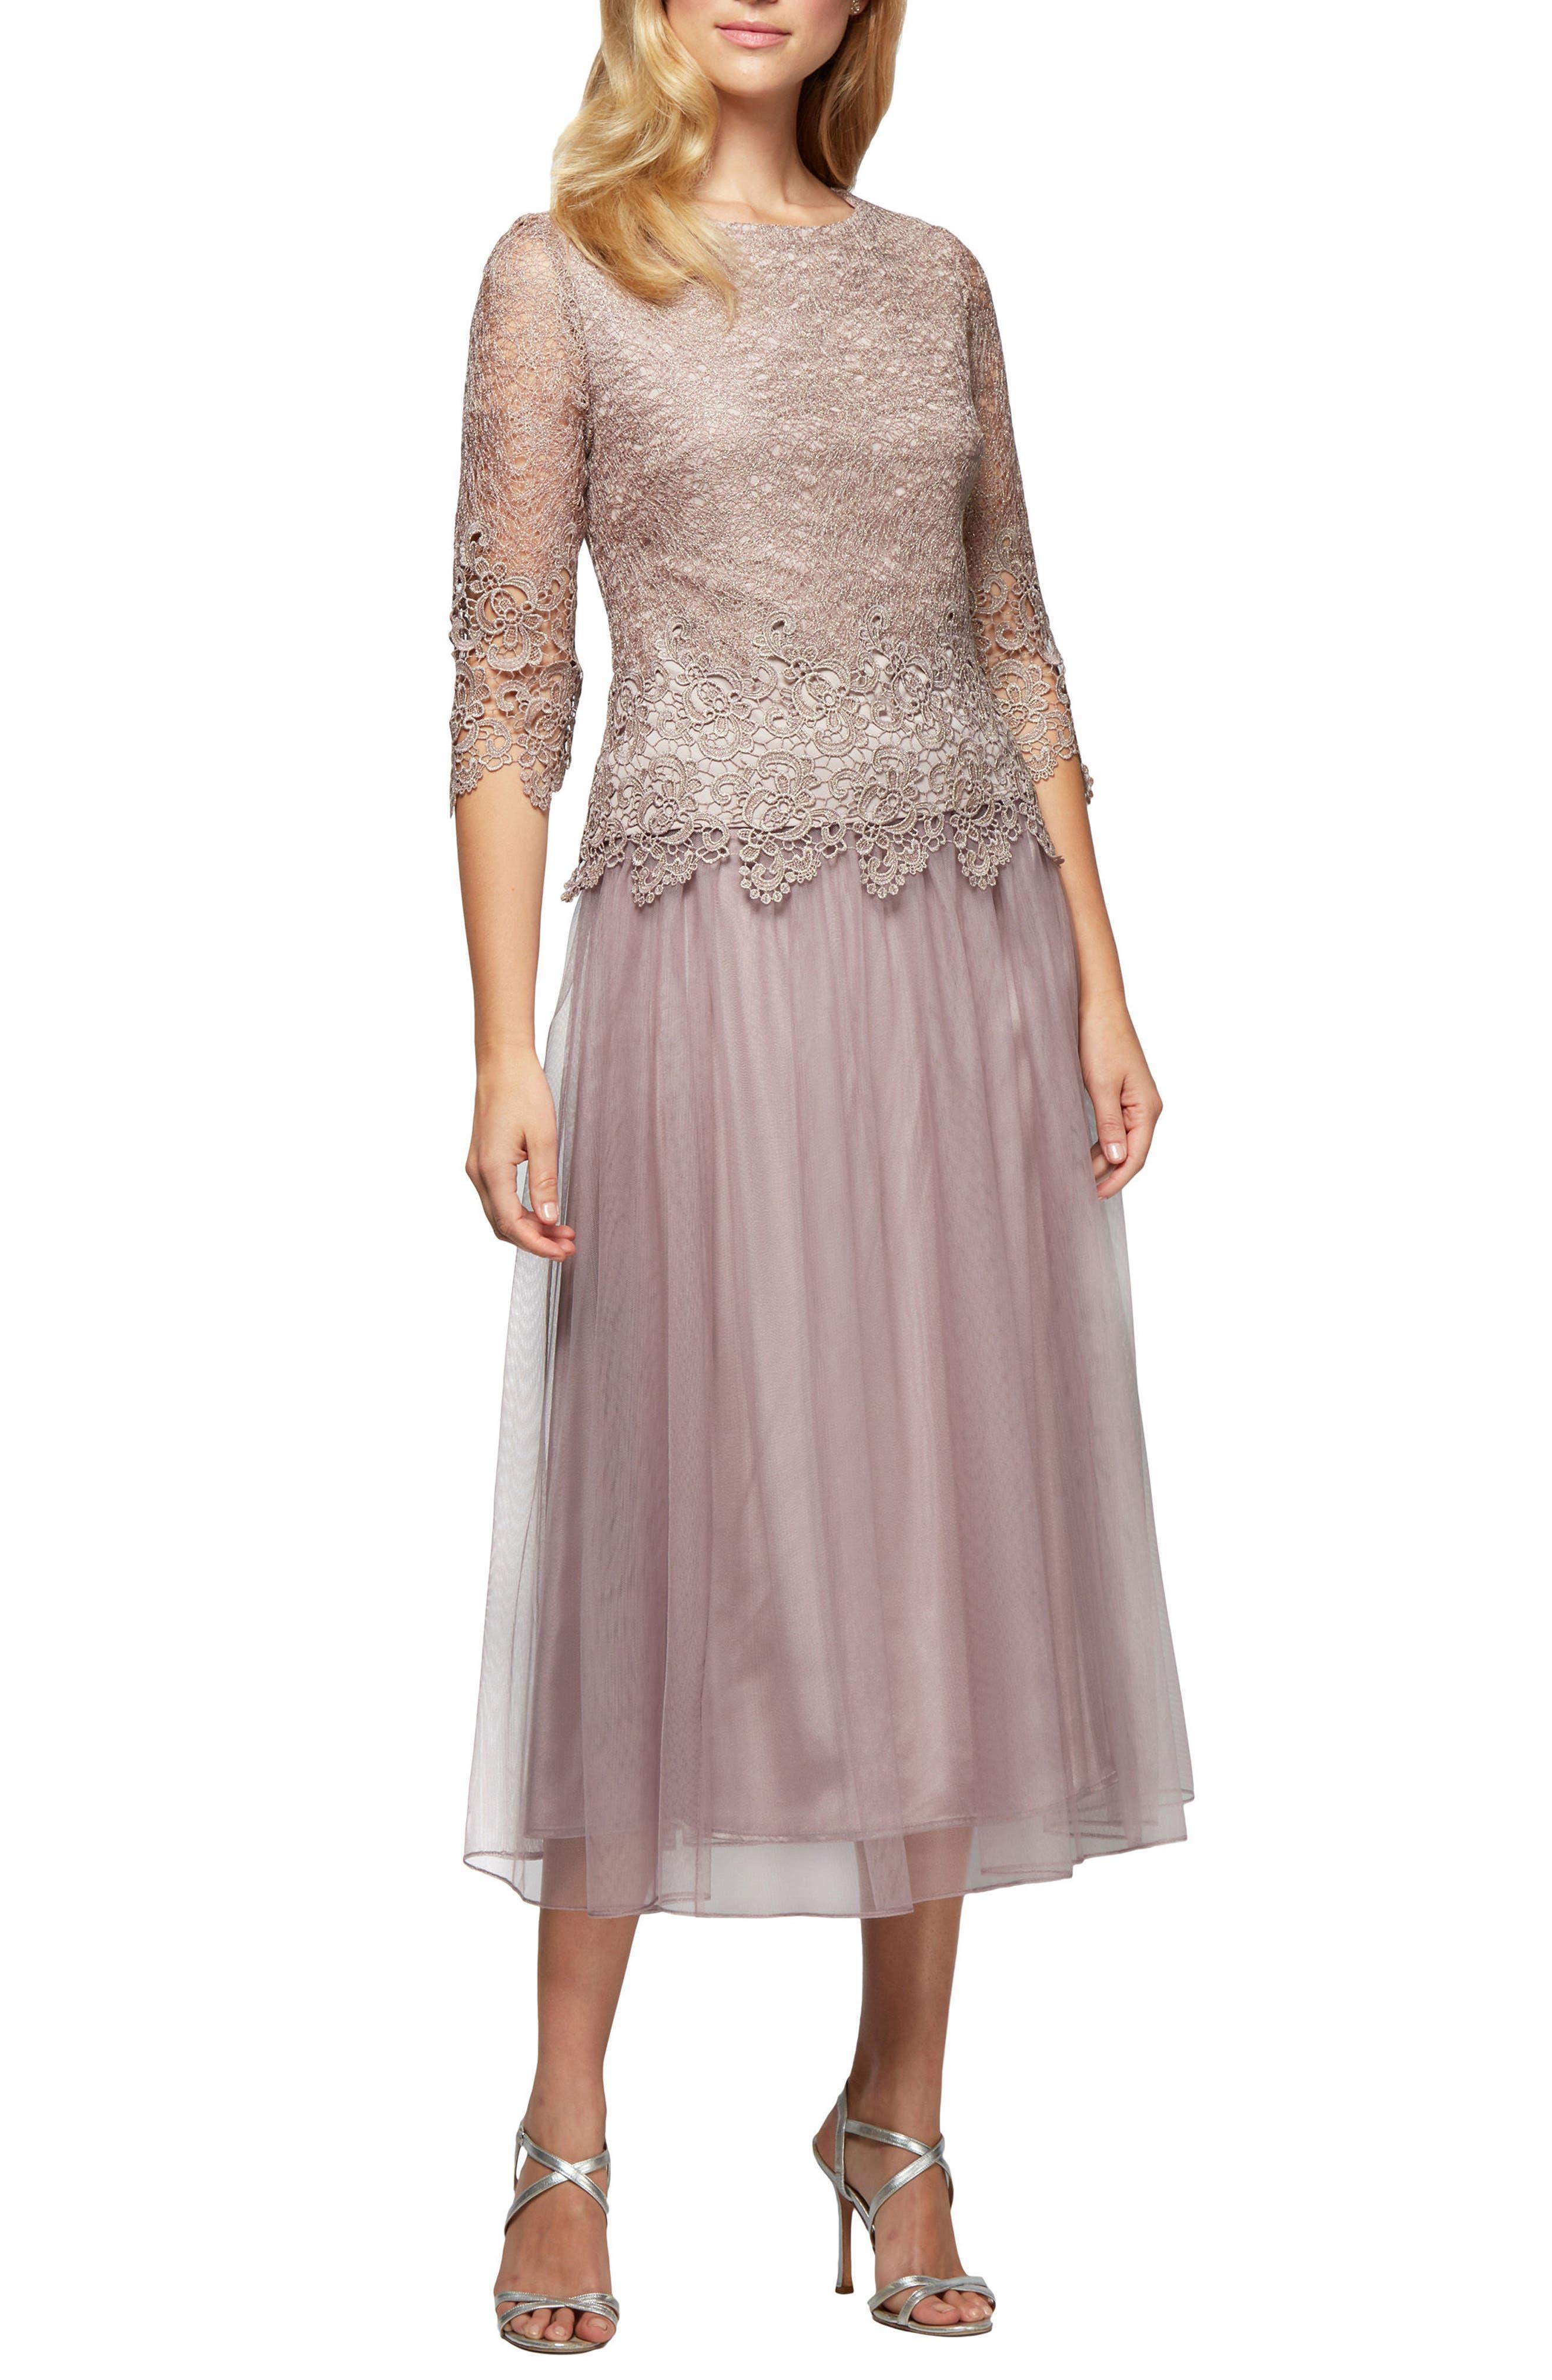 Alternate Image 1 Selected - Alex Evenings Mock Two-Piece Tea Length Dress